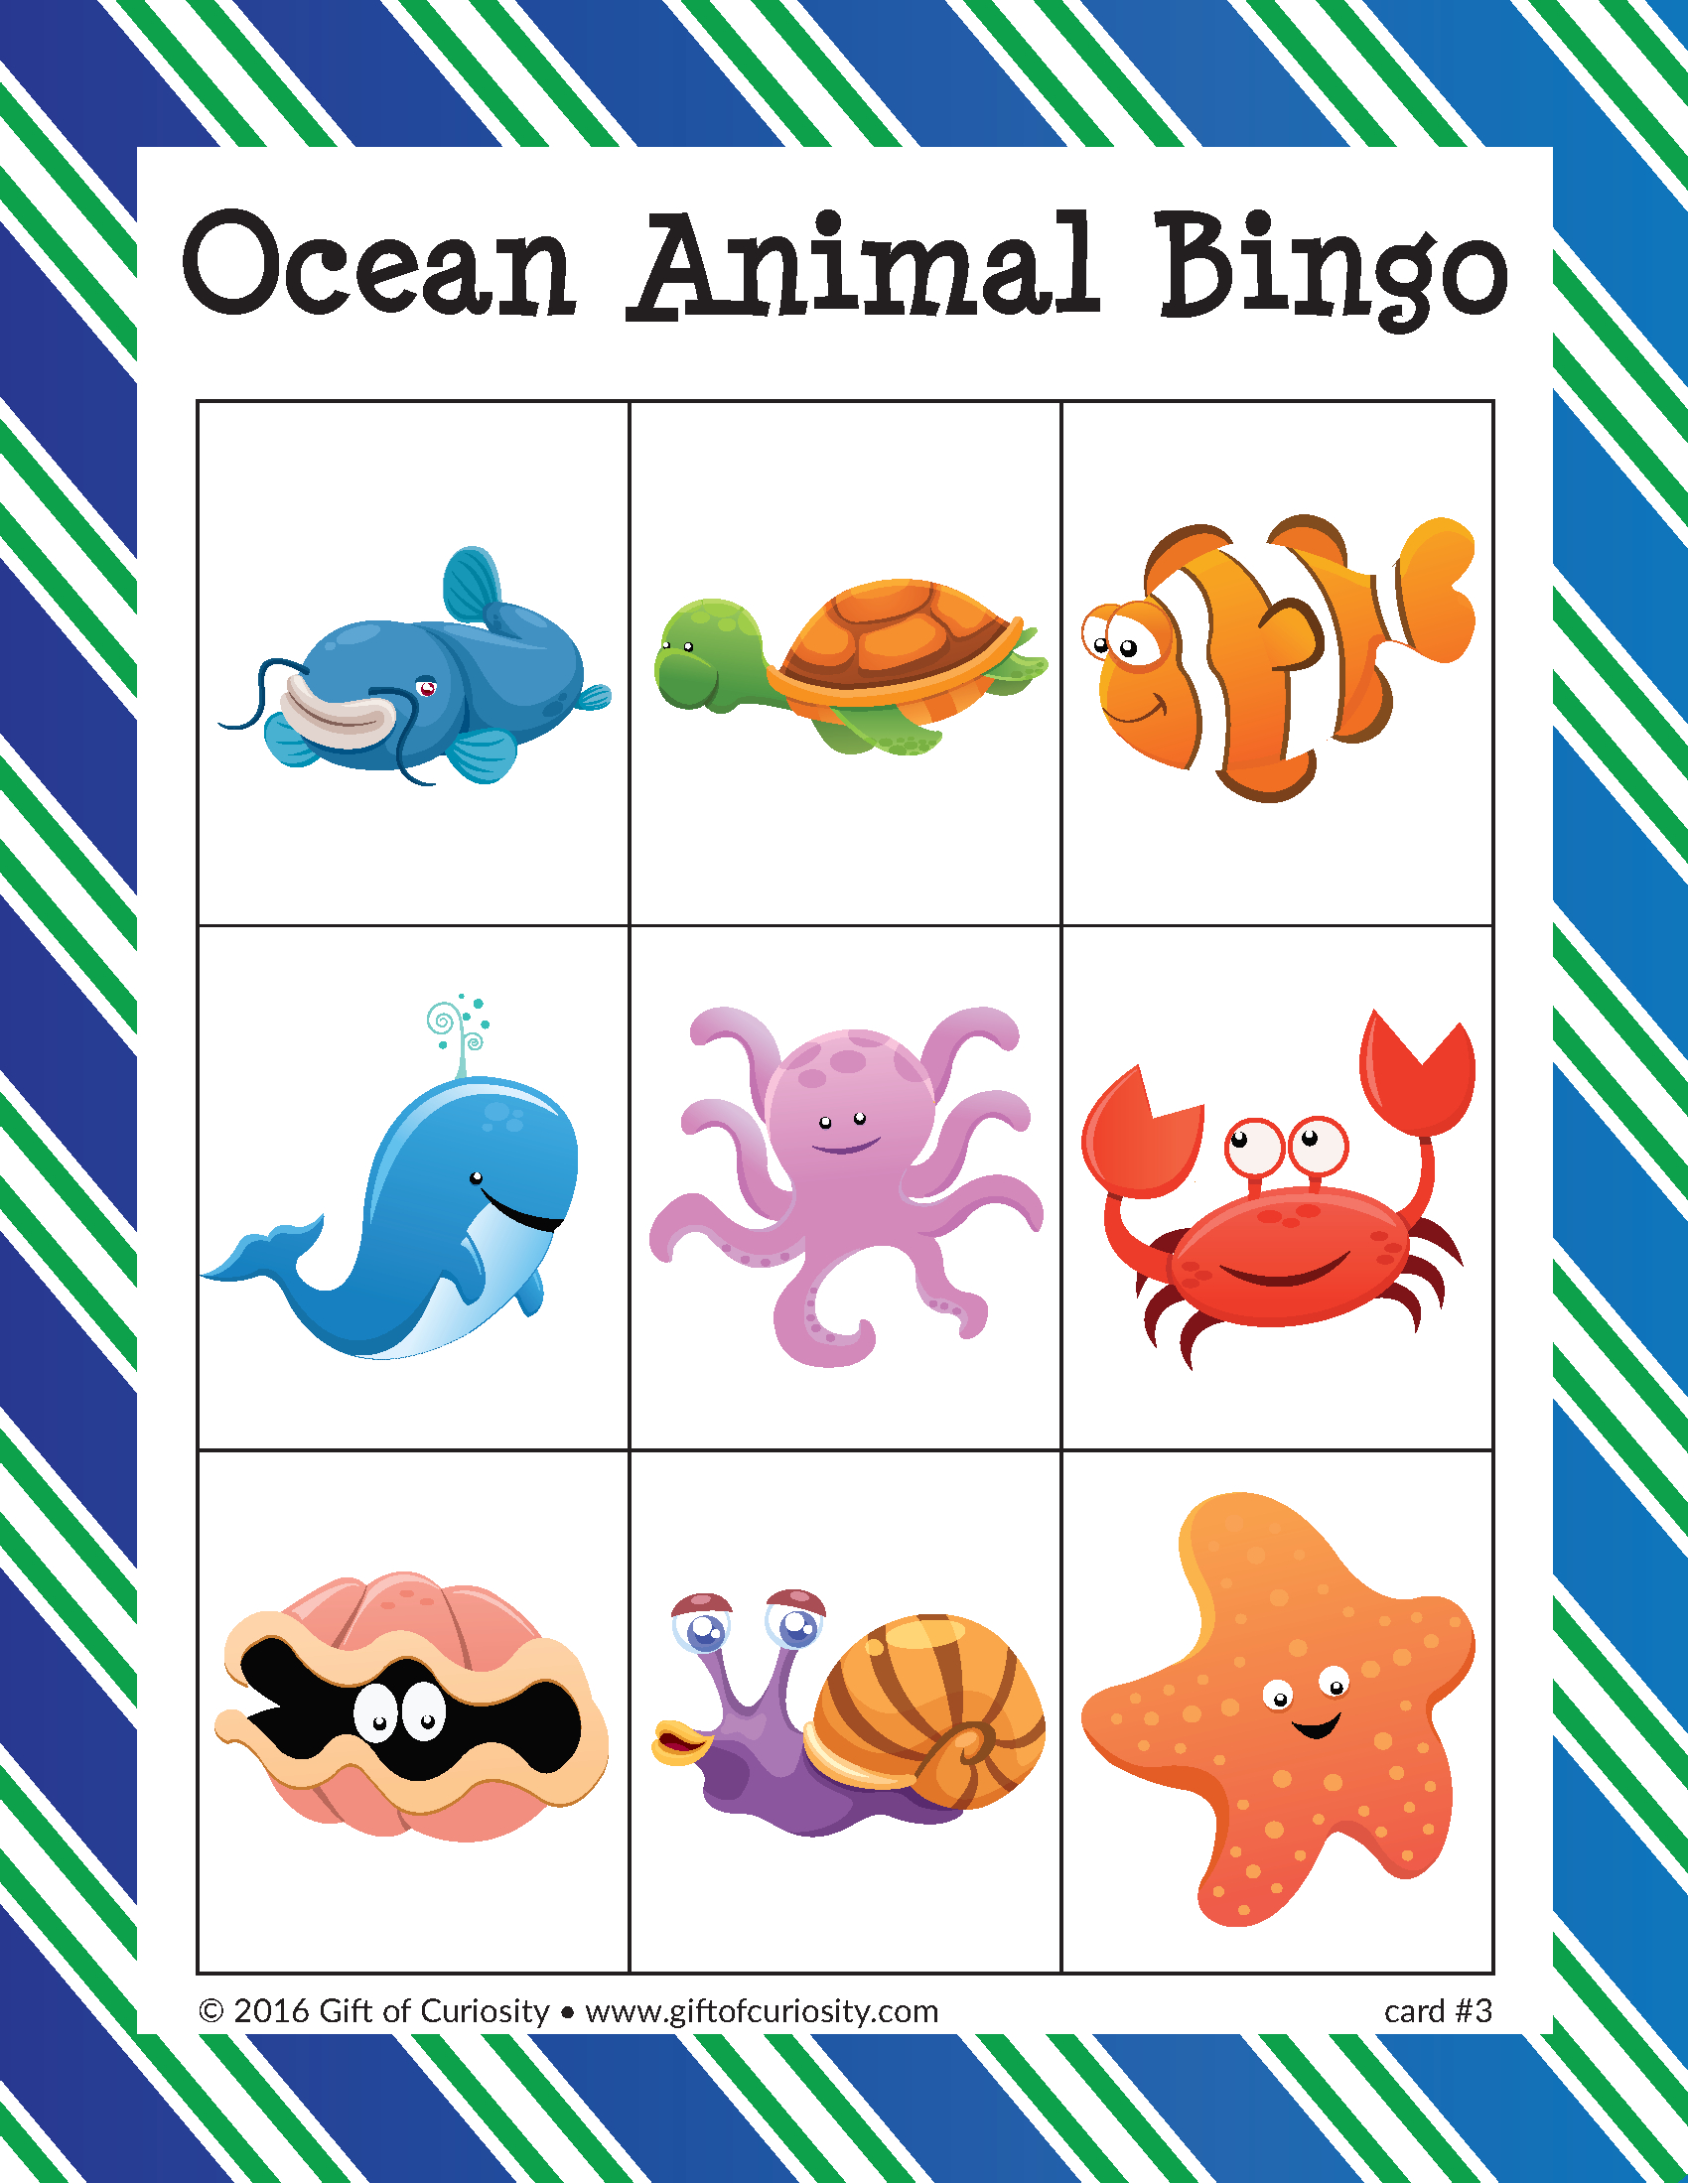 Ocean Animal Bingo - Gift Of Curiosity